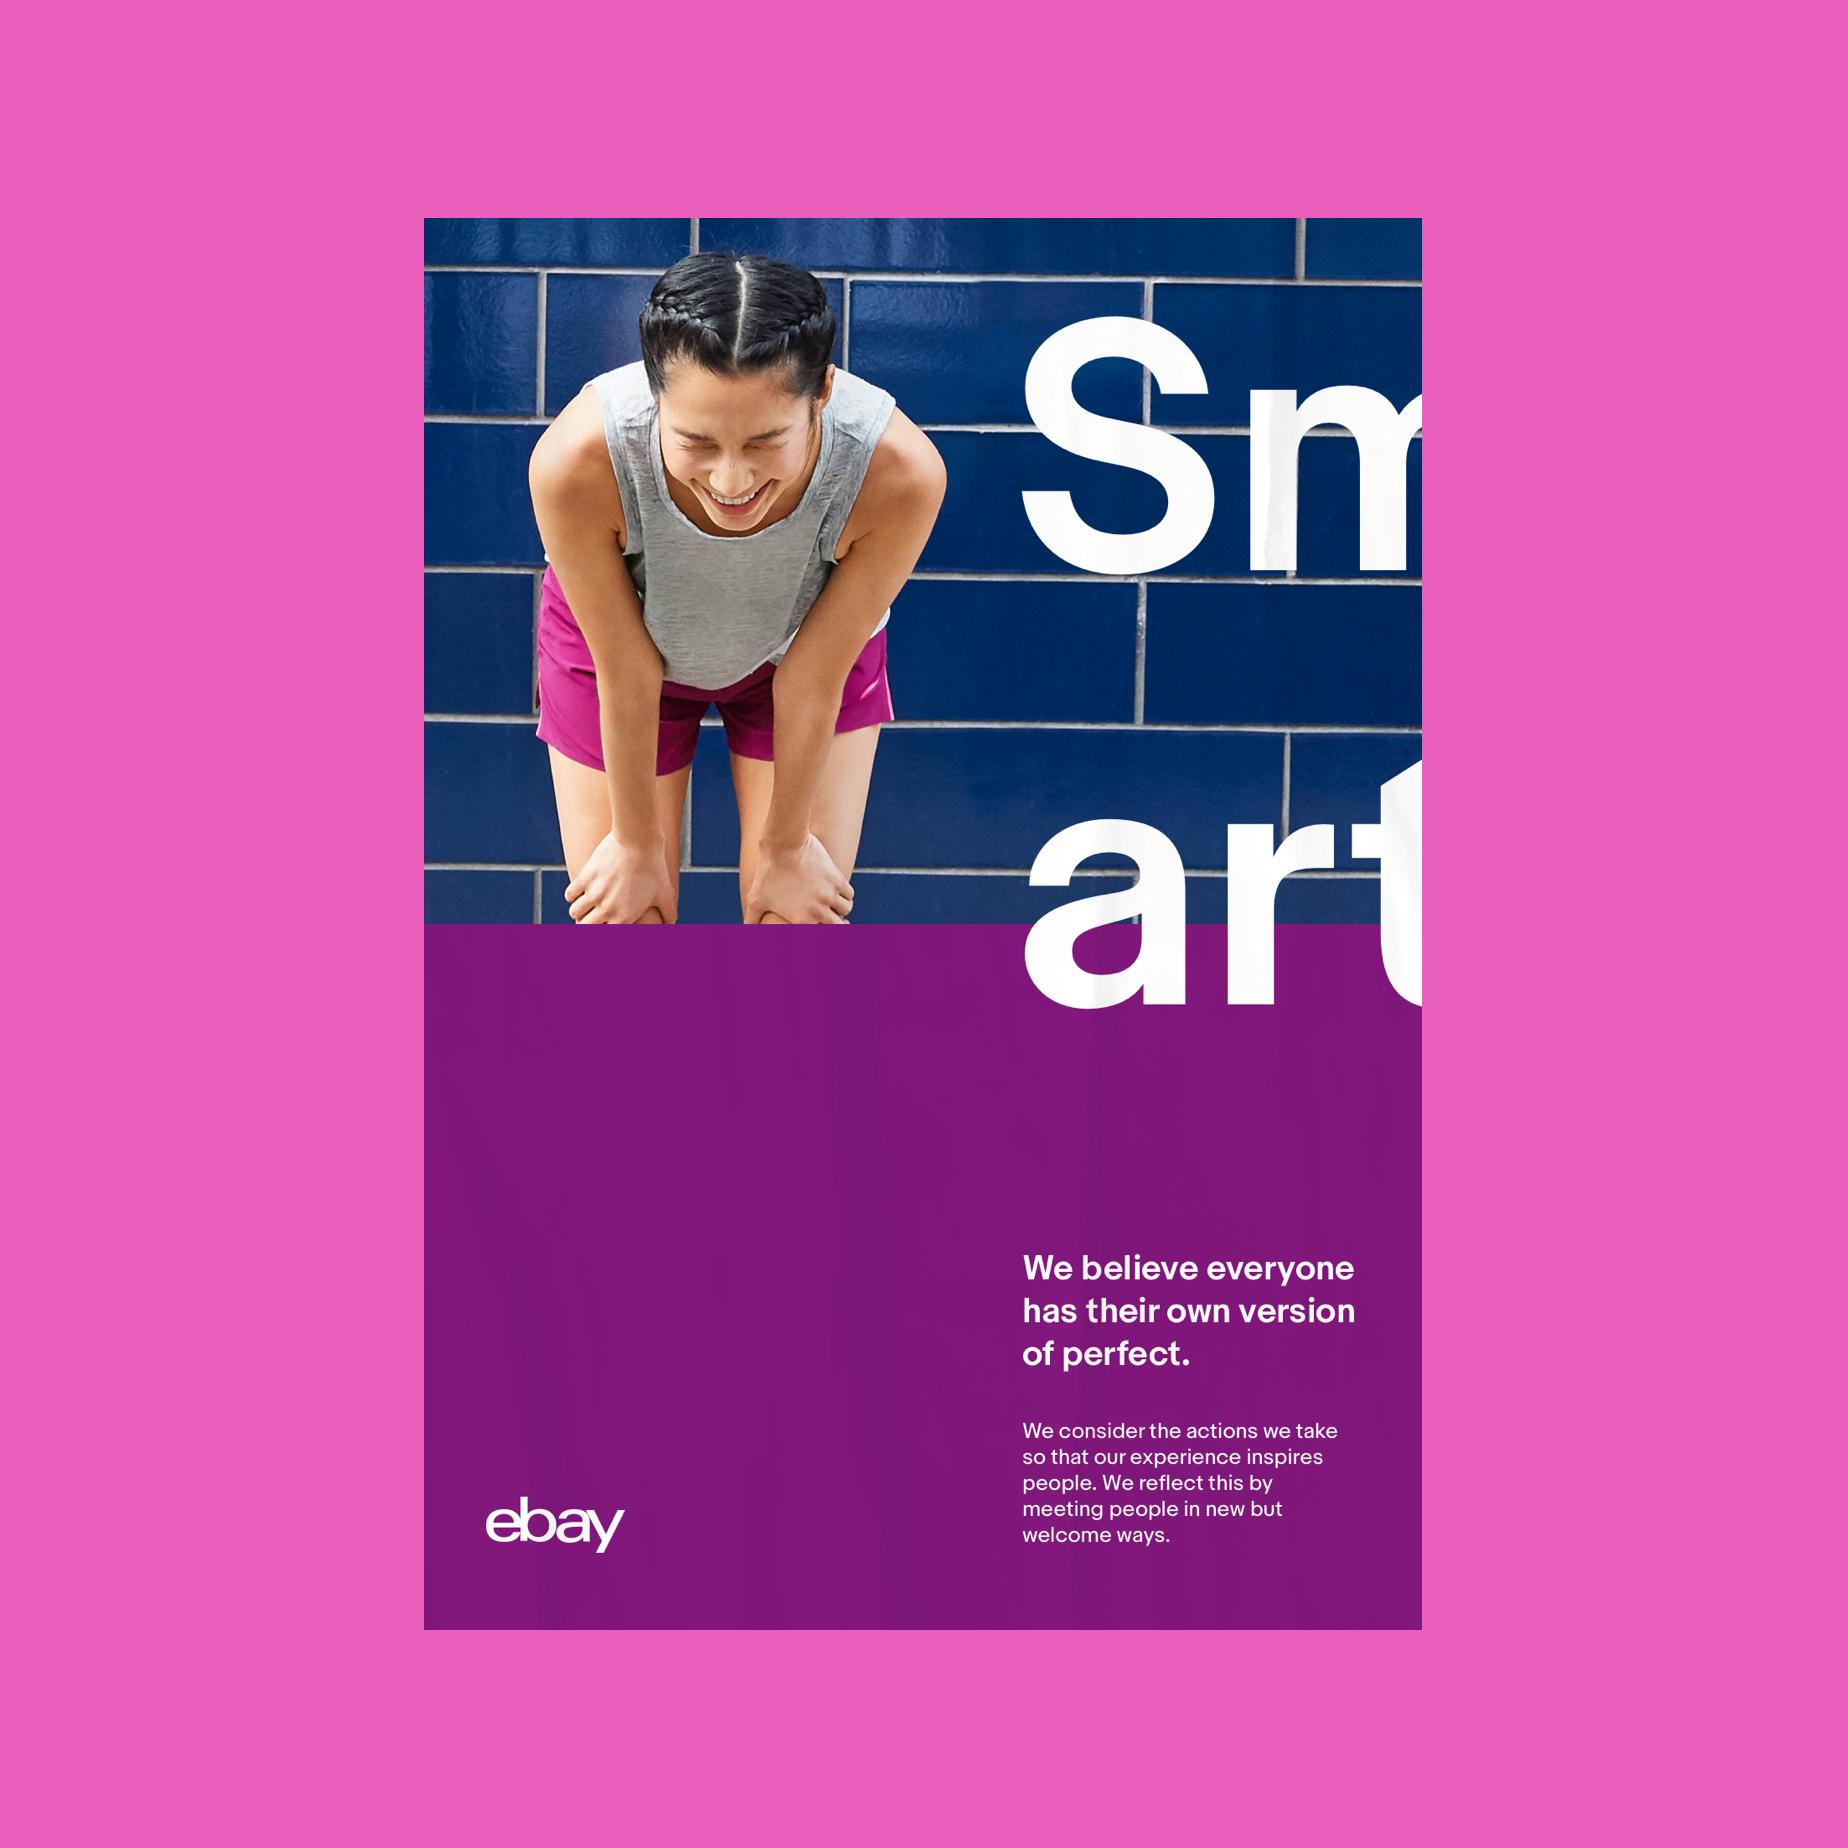 eBay_Posters_Smart